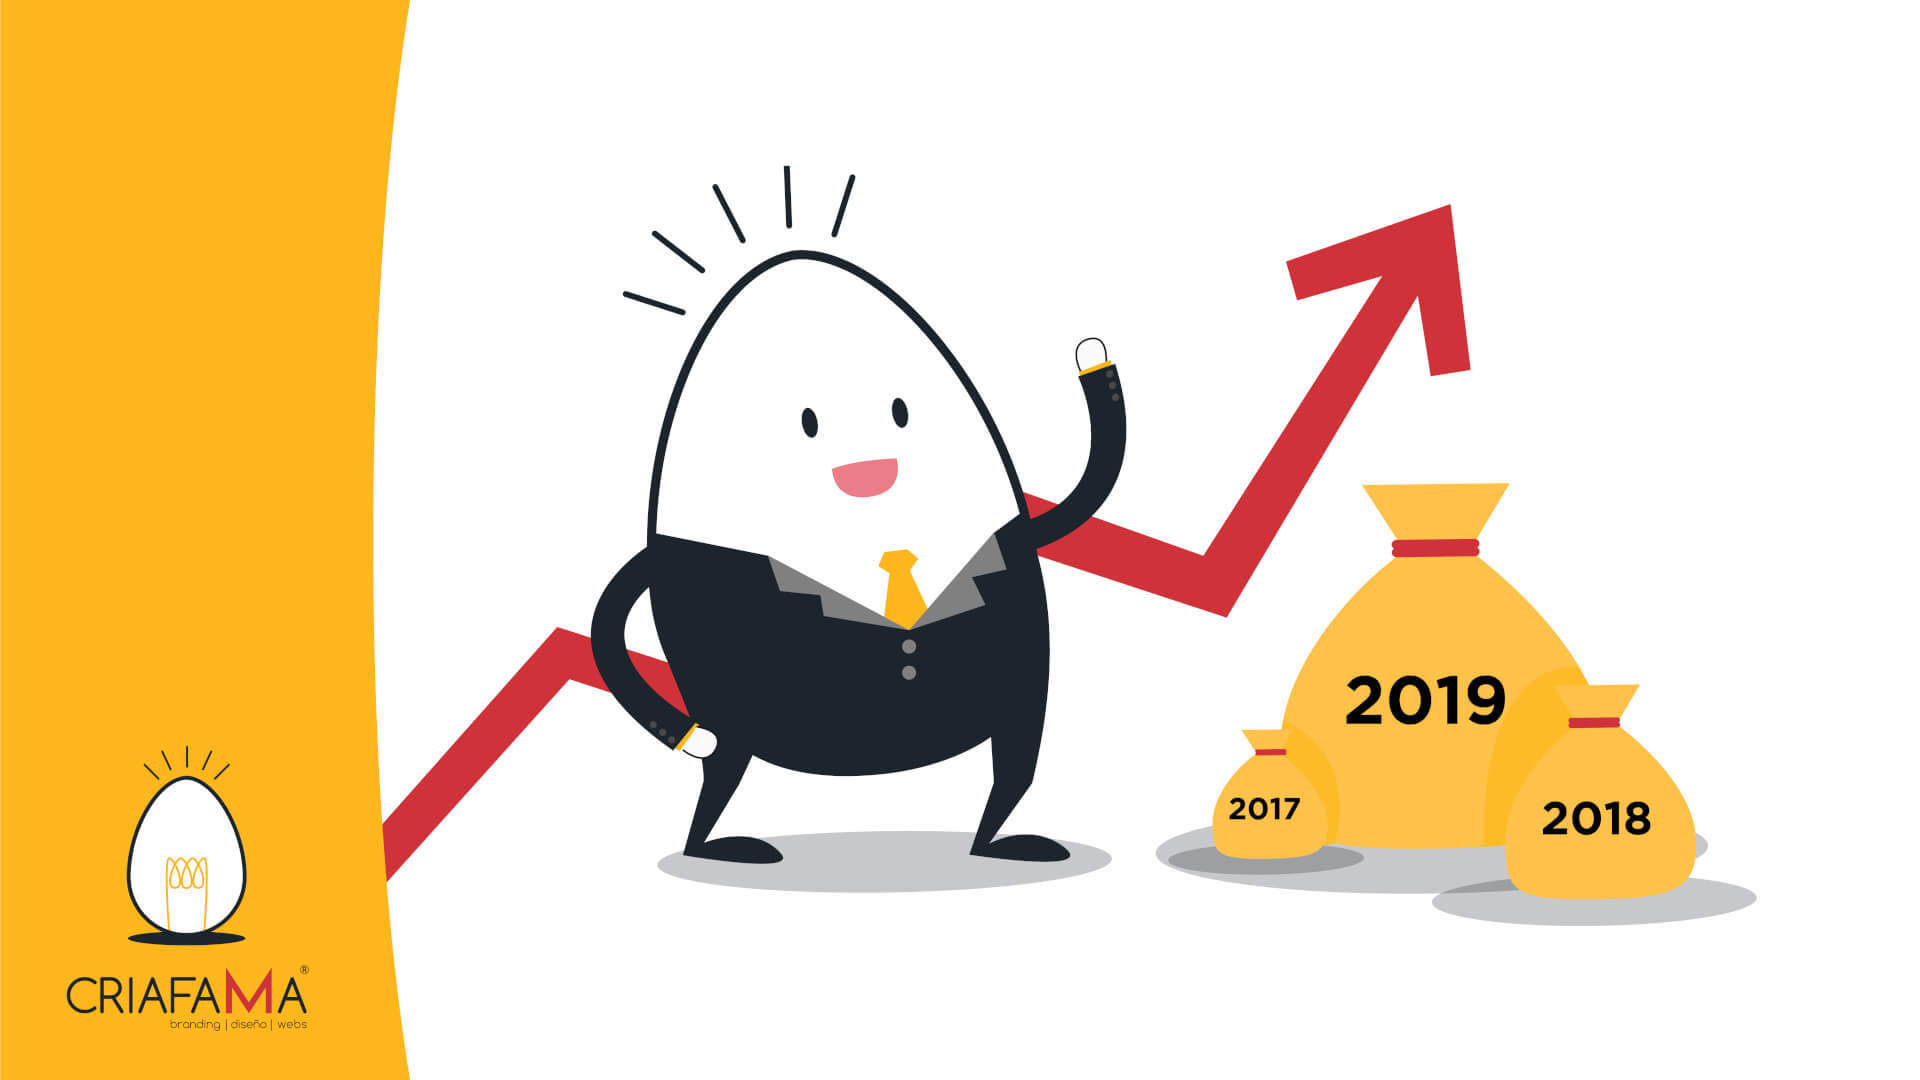 mejora tu empresa en 2019